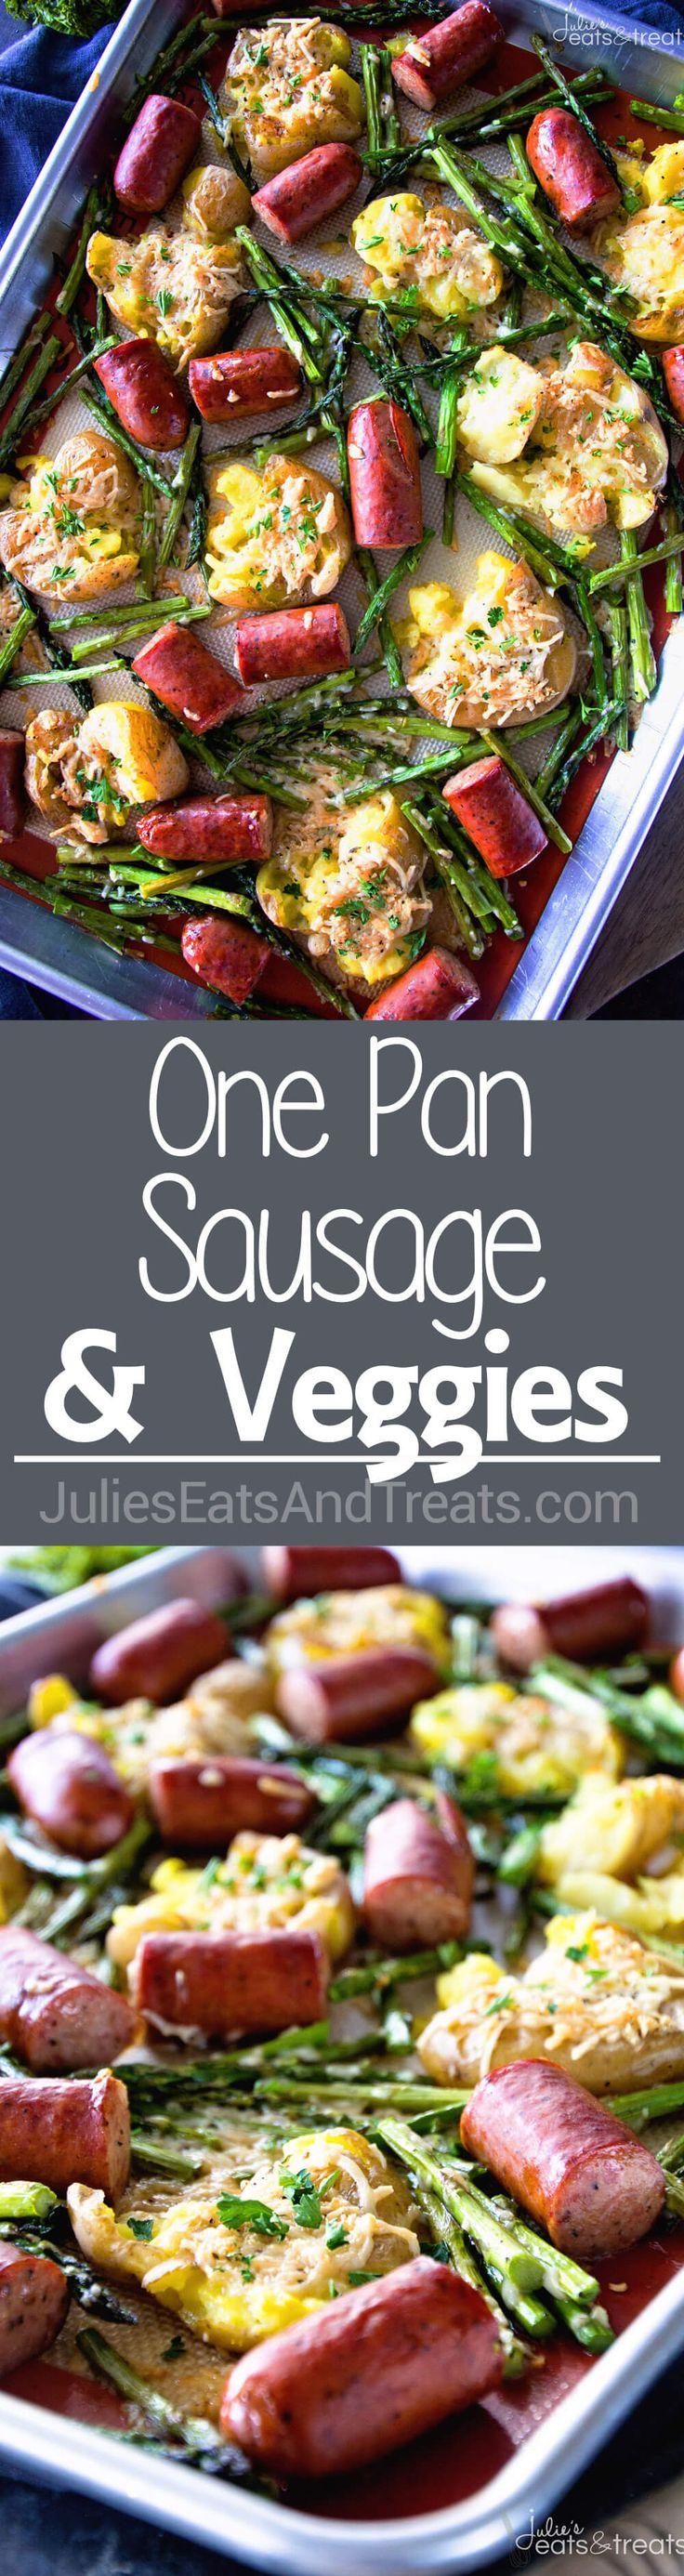 1000+ images about Sausage & Hot Dog Dishes on Pinterest | Skillets ...